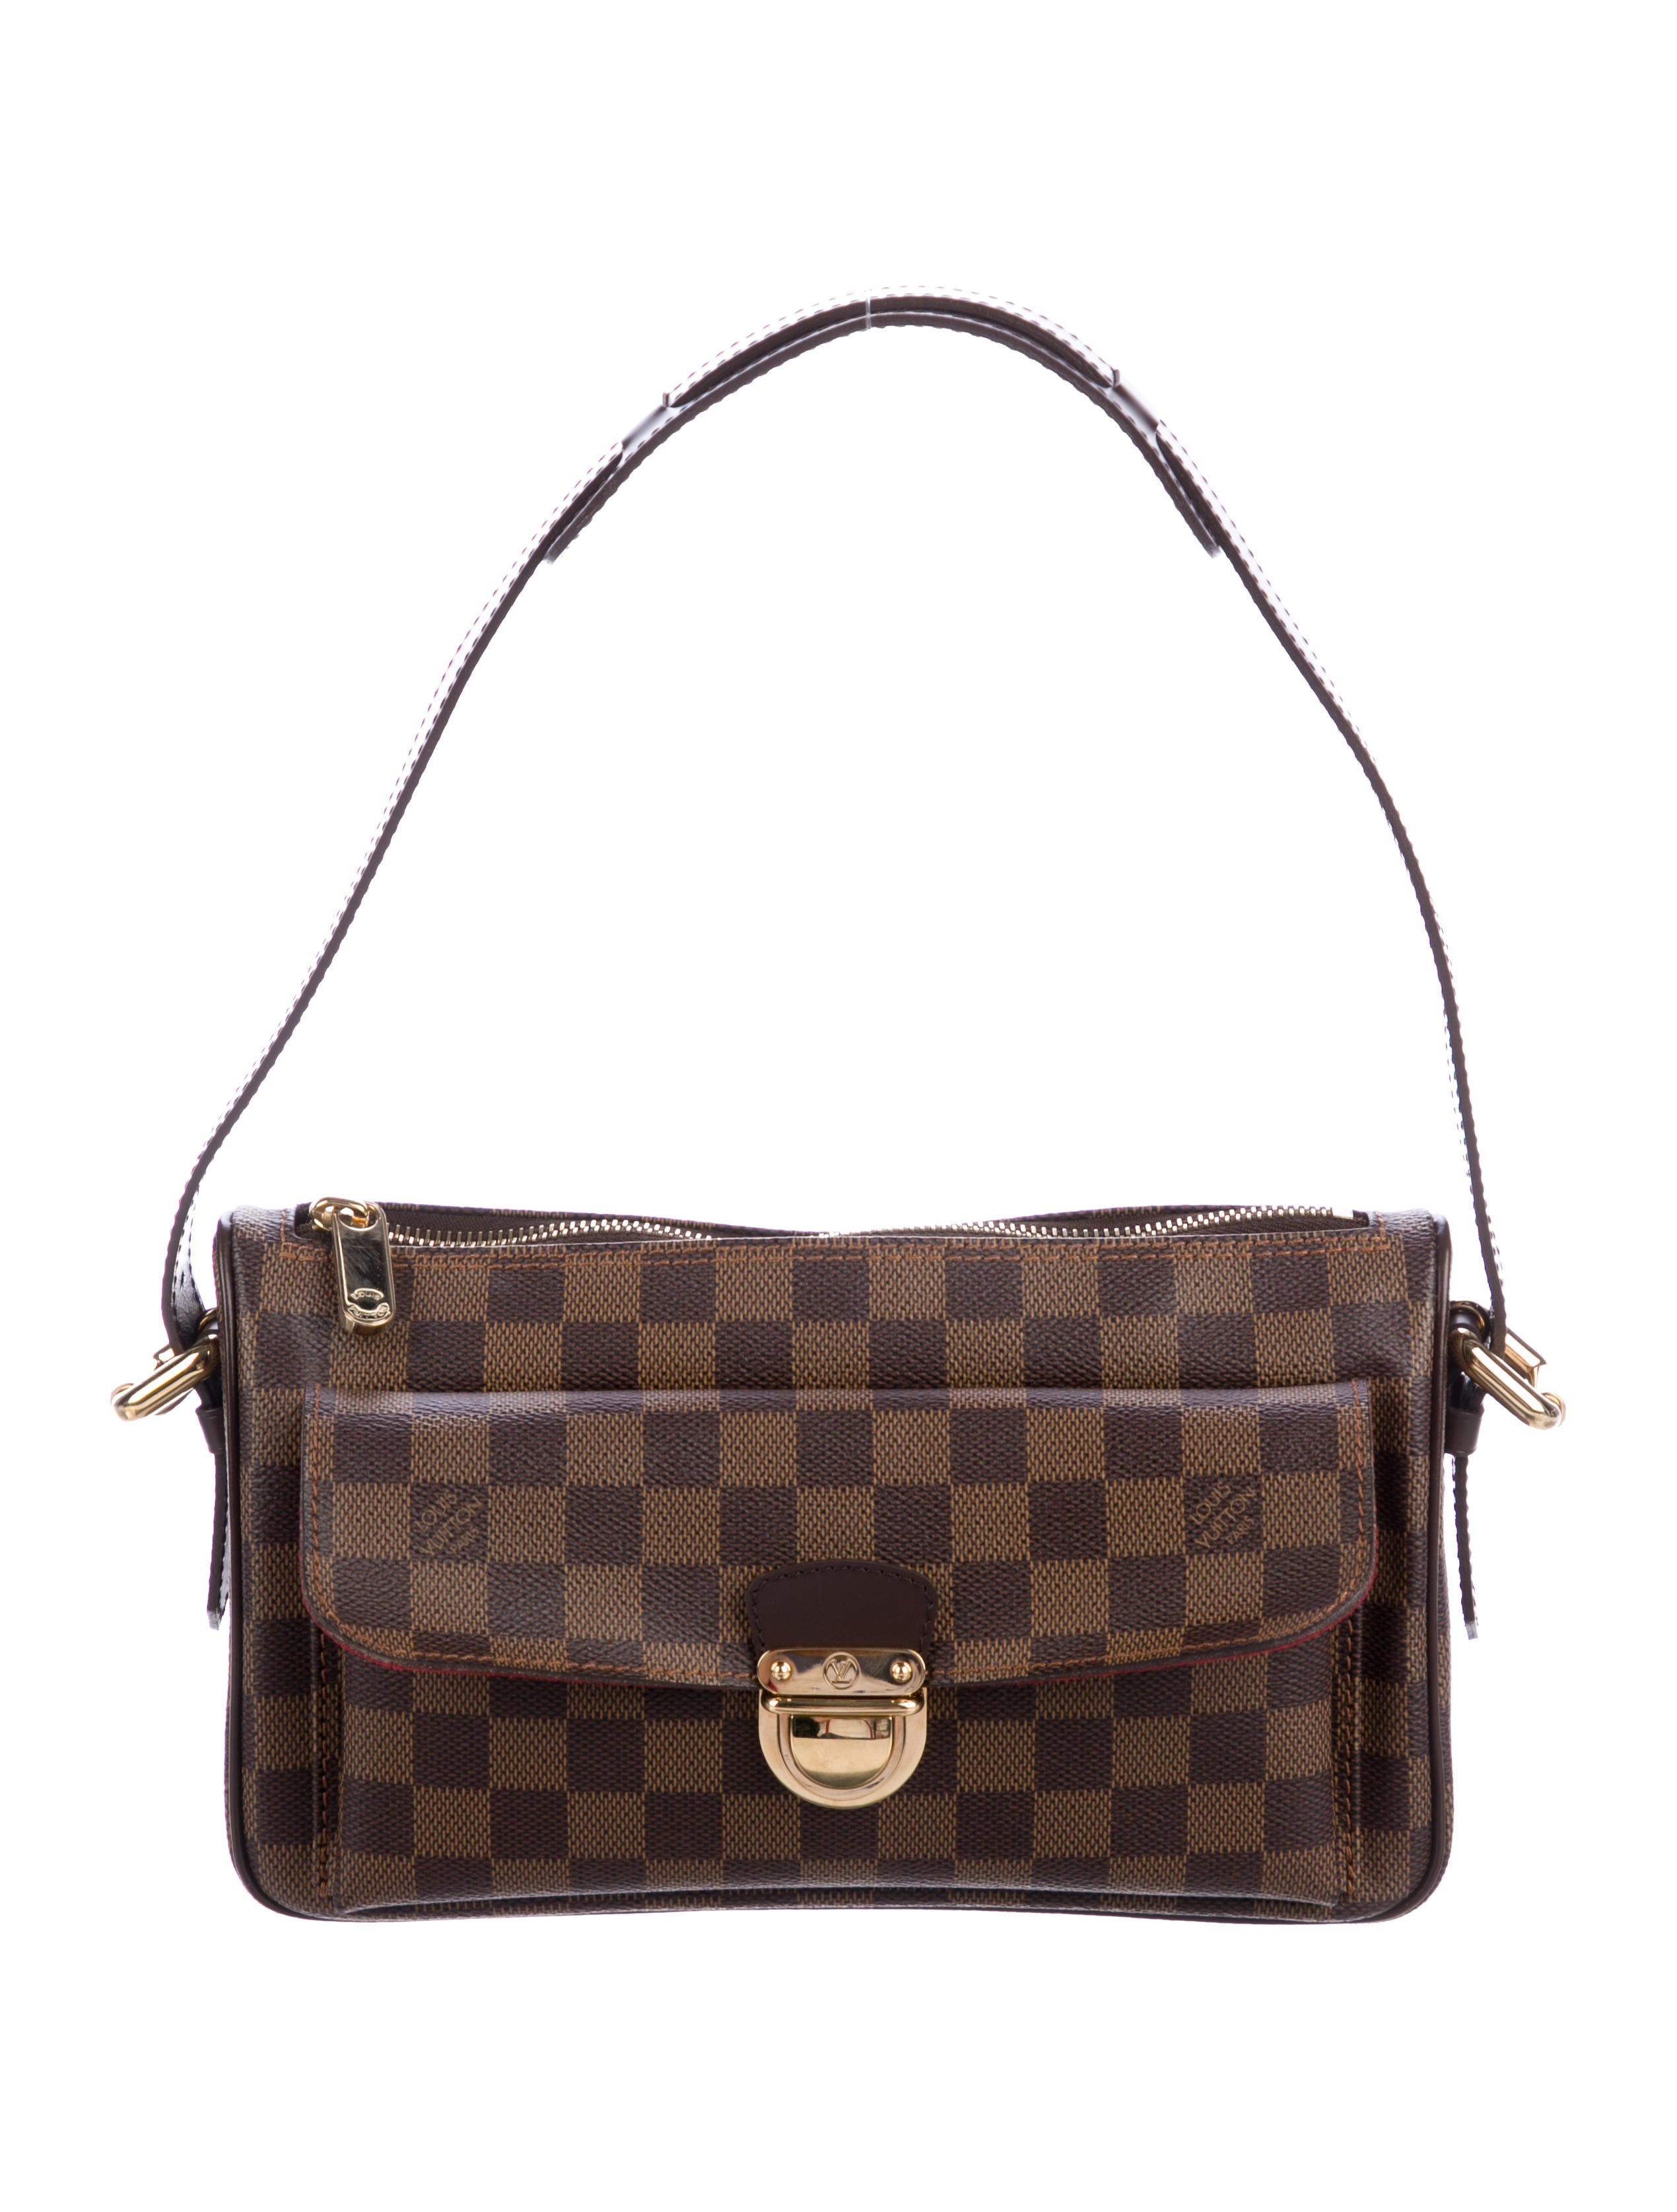 1e038f37c4ad Louis Vuitton Damier Ebene Ravello GM - Handbags - LOU213860